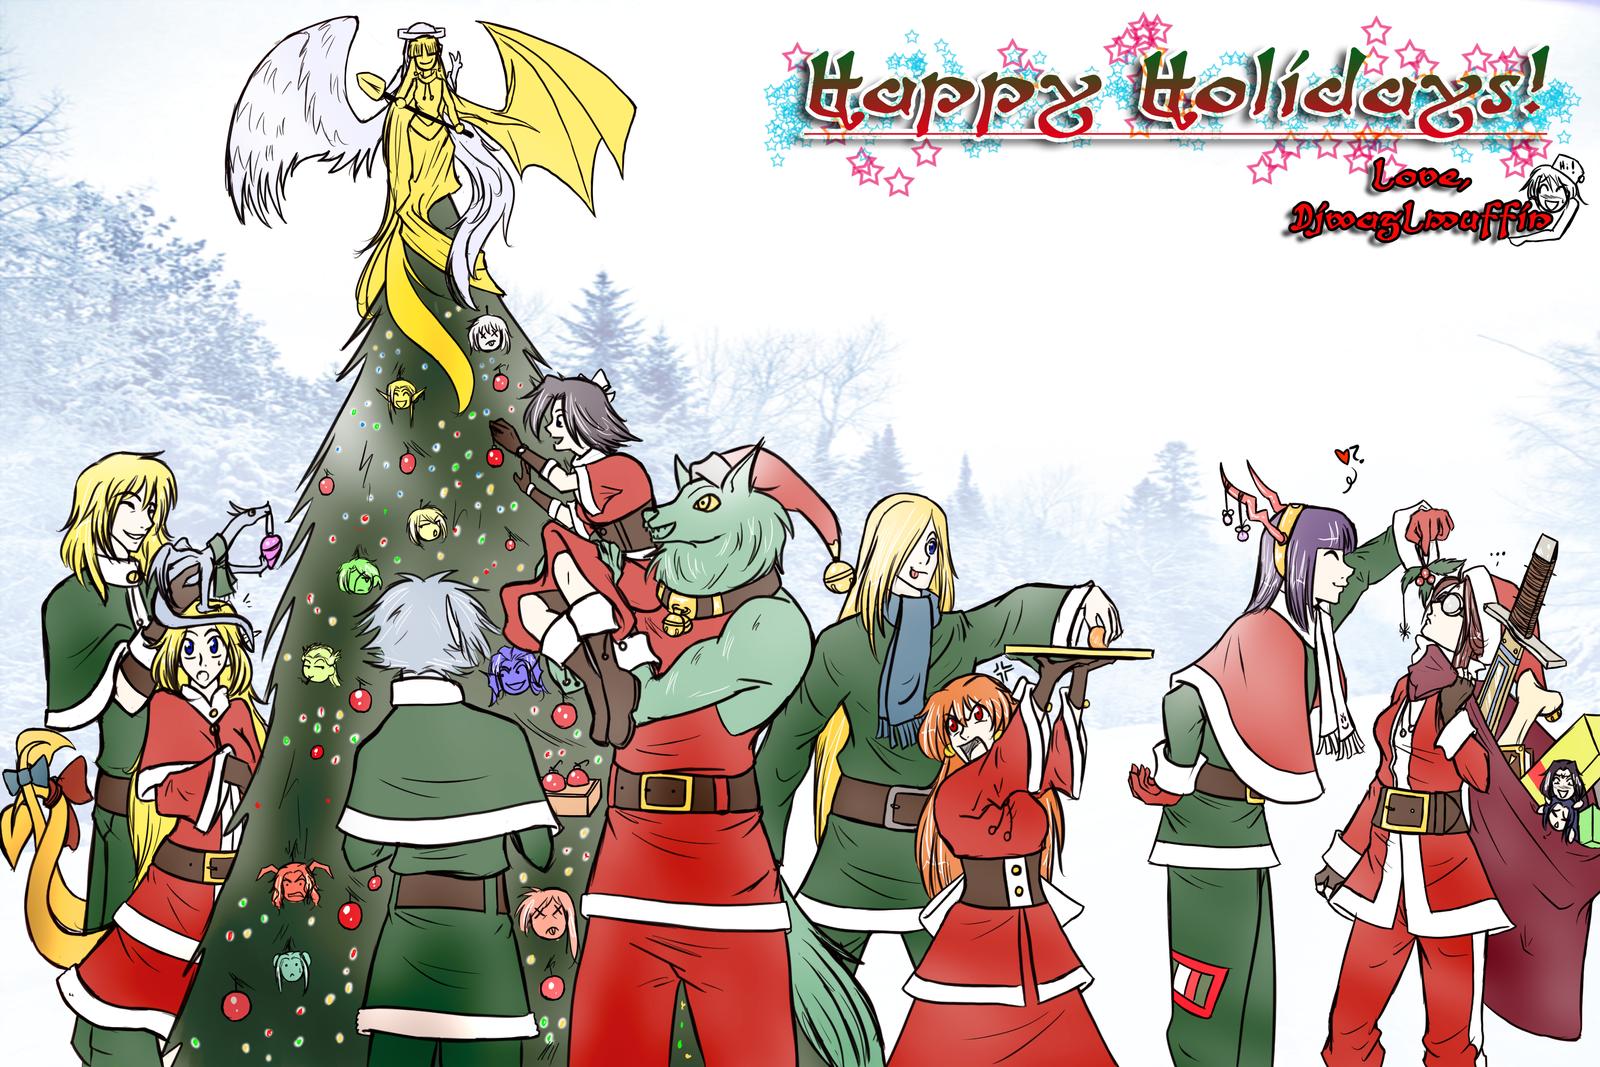 Happy Holidays by djwagLmuffin